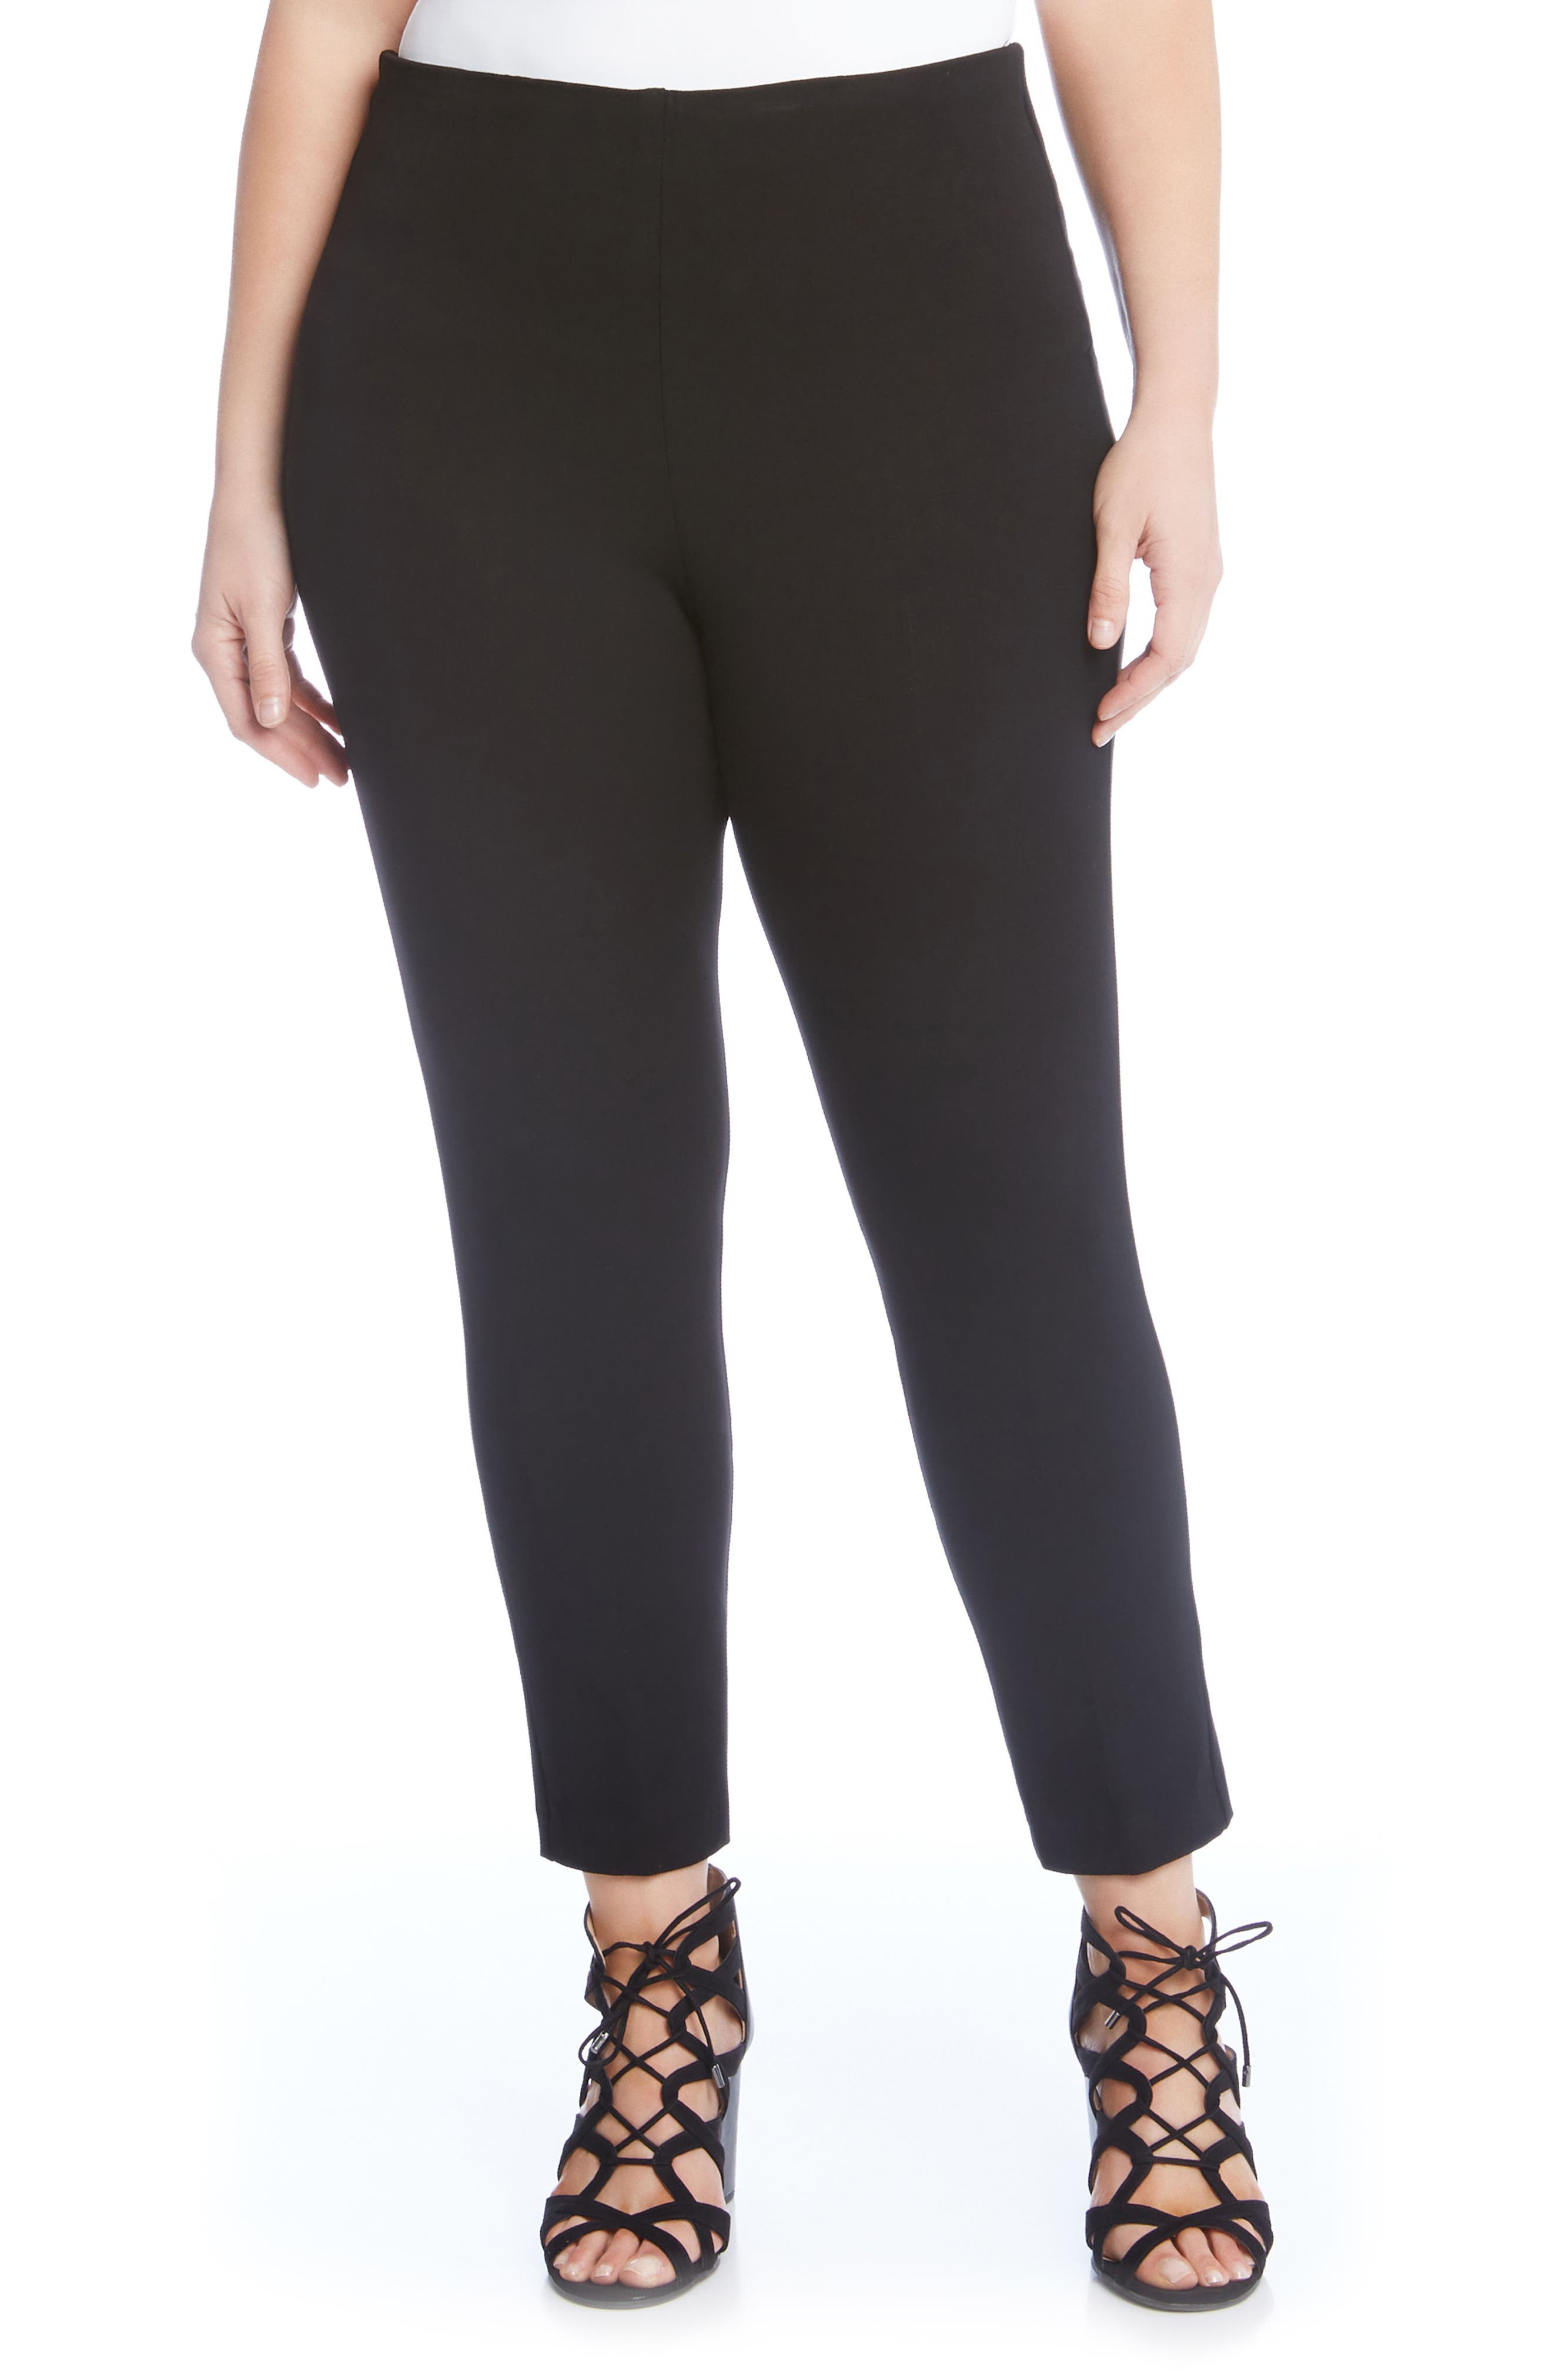 KAREN KANE, Piper Skinny Ankle Pants, Main thumbnail 1, color, BLACK